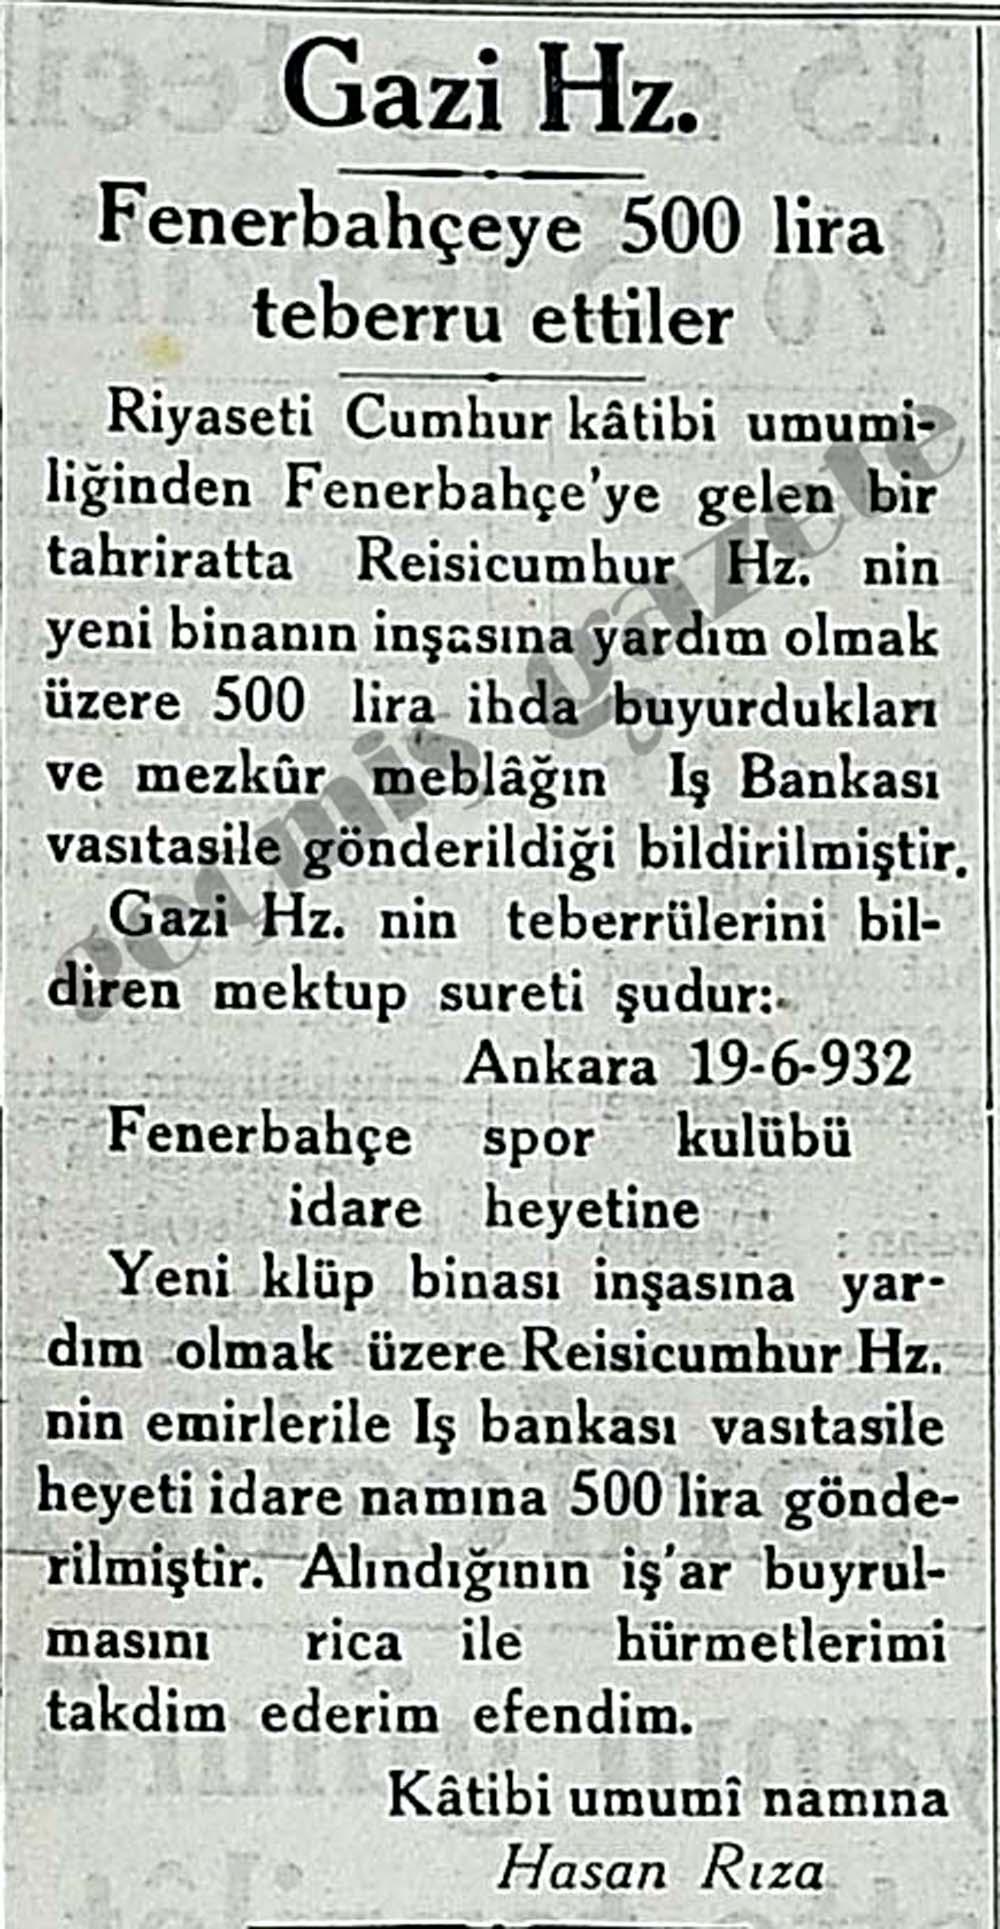 Gazi Hz. Fenerbahçeye 500 lira teberru ettiler